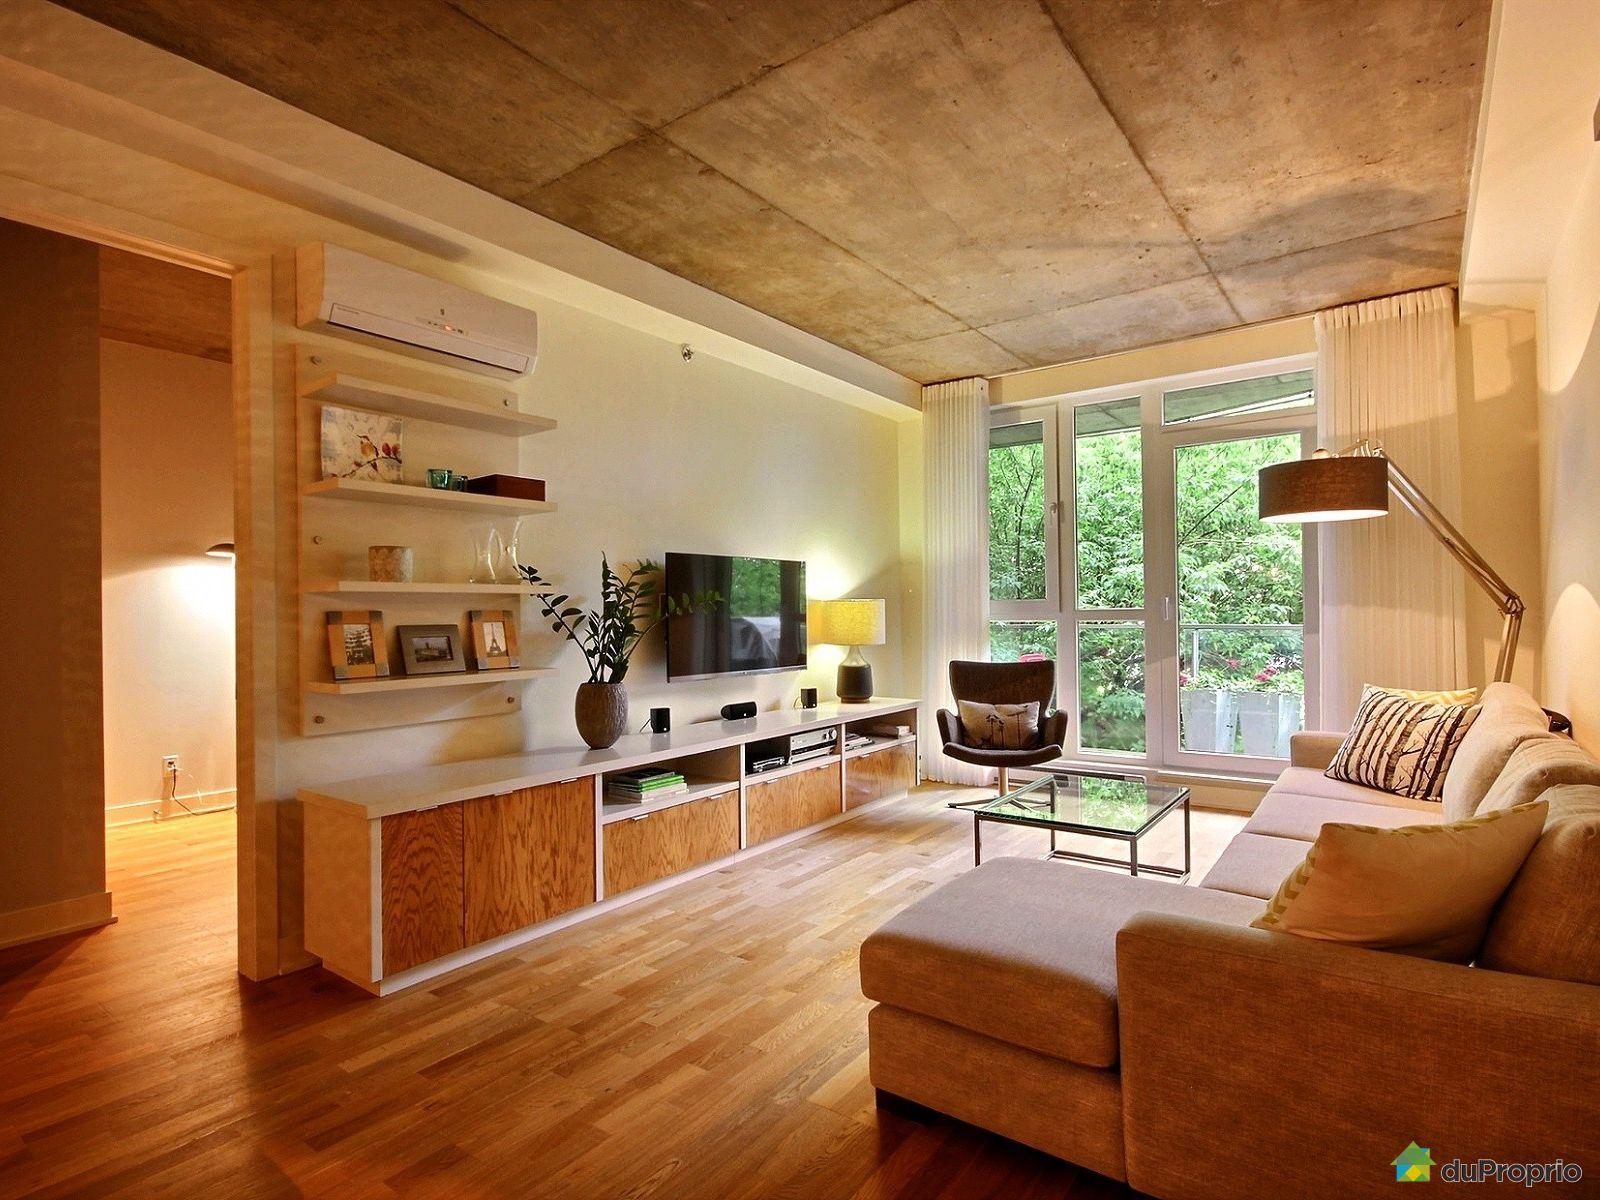 Living Room Ave U Menu Condo For Sale In Montreal 205 950 Avenue Chagneur